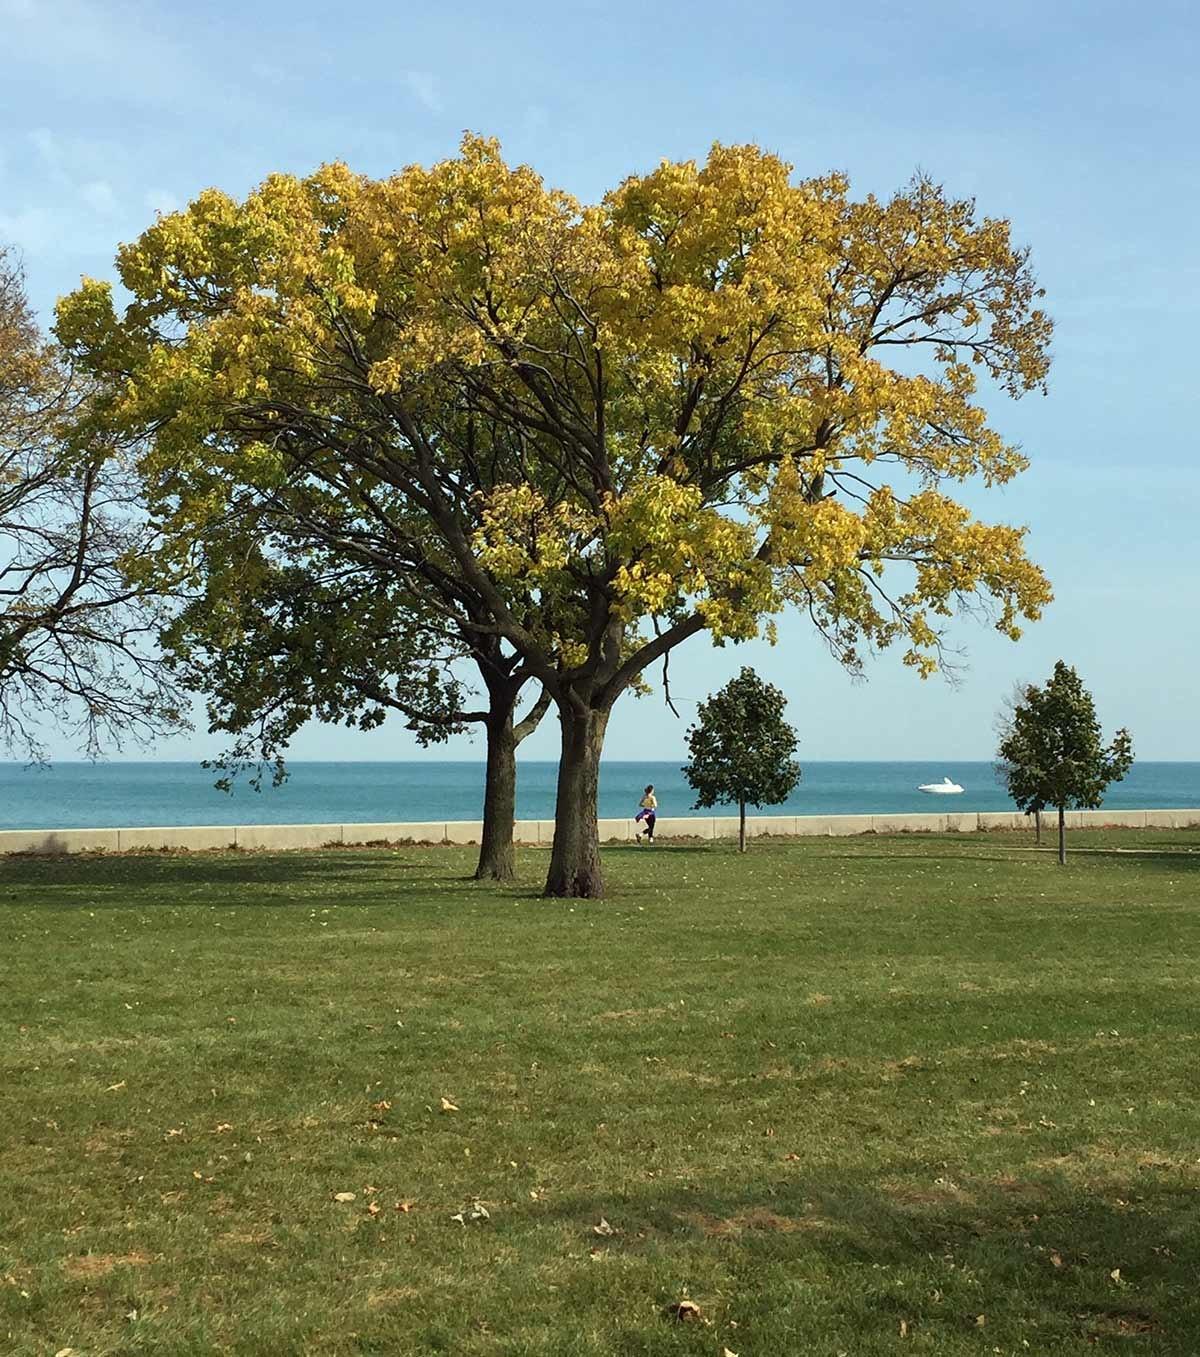 Lake Michigan/Belmont Harbor